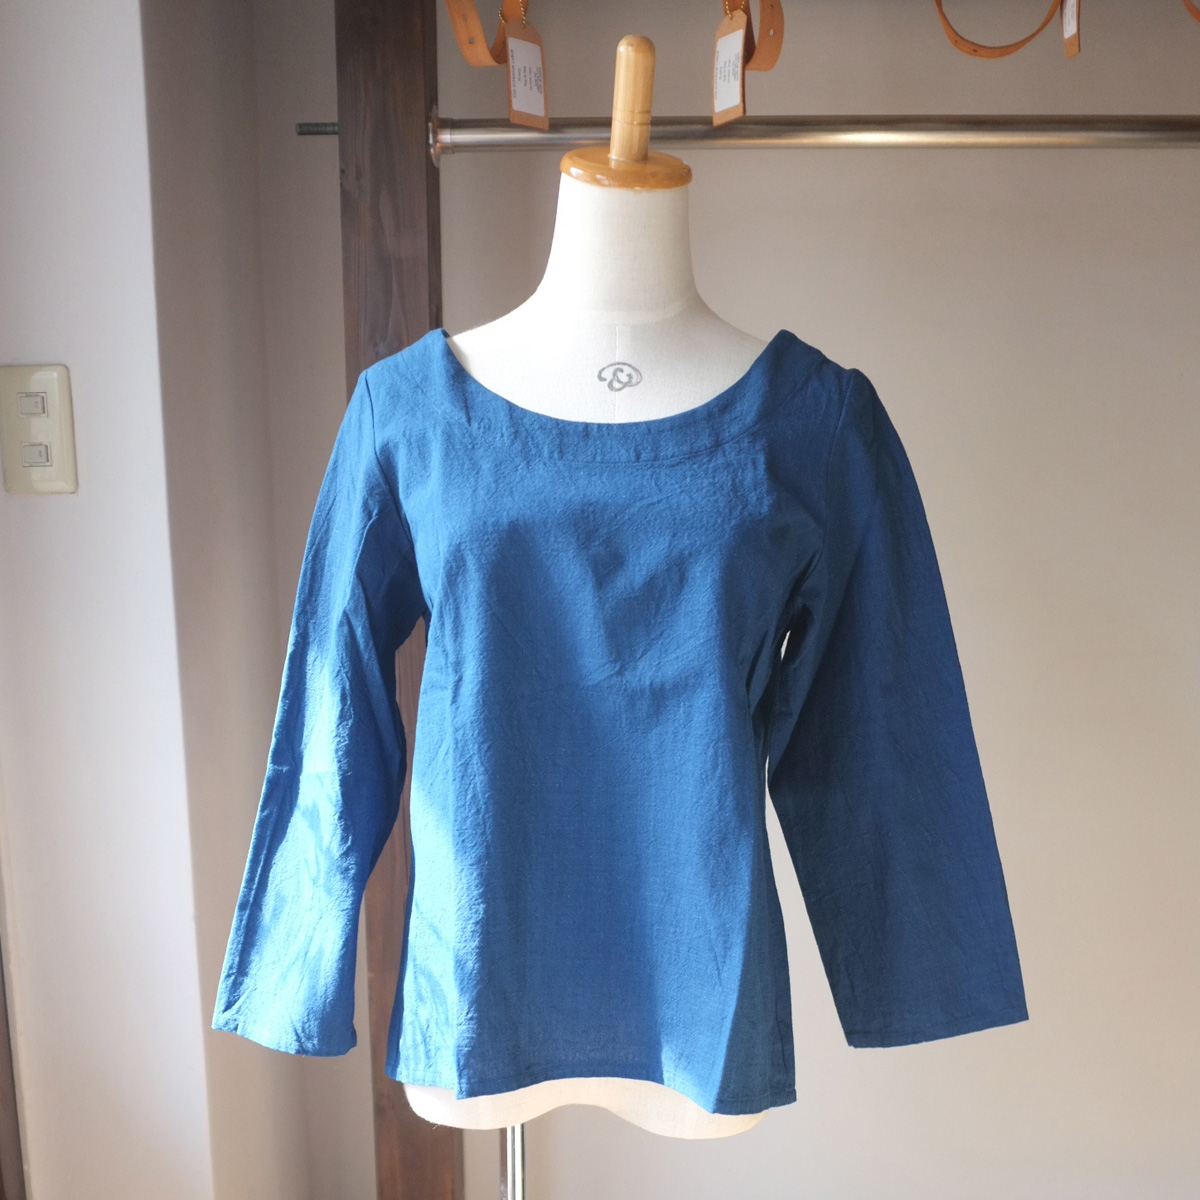 YAMMA ヤンマ 備後 丸首シャツ colors 2020A W新作送料無料 2 ブランド買うならブランドオフ 大えり